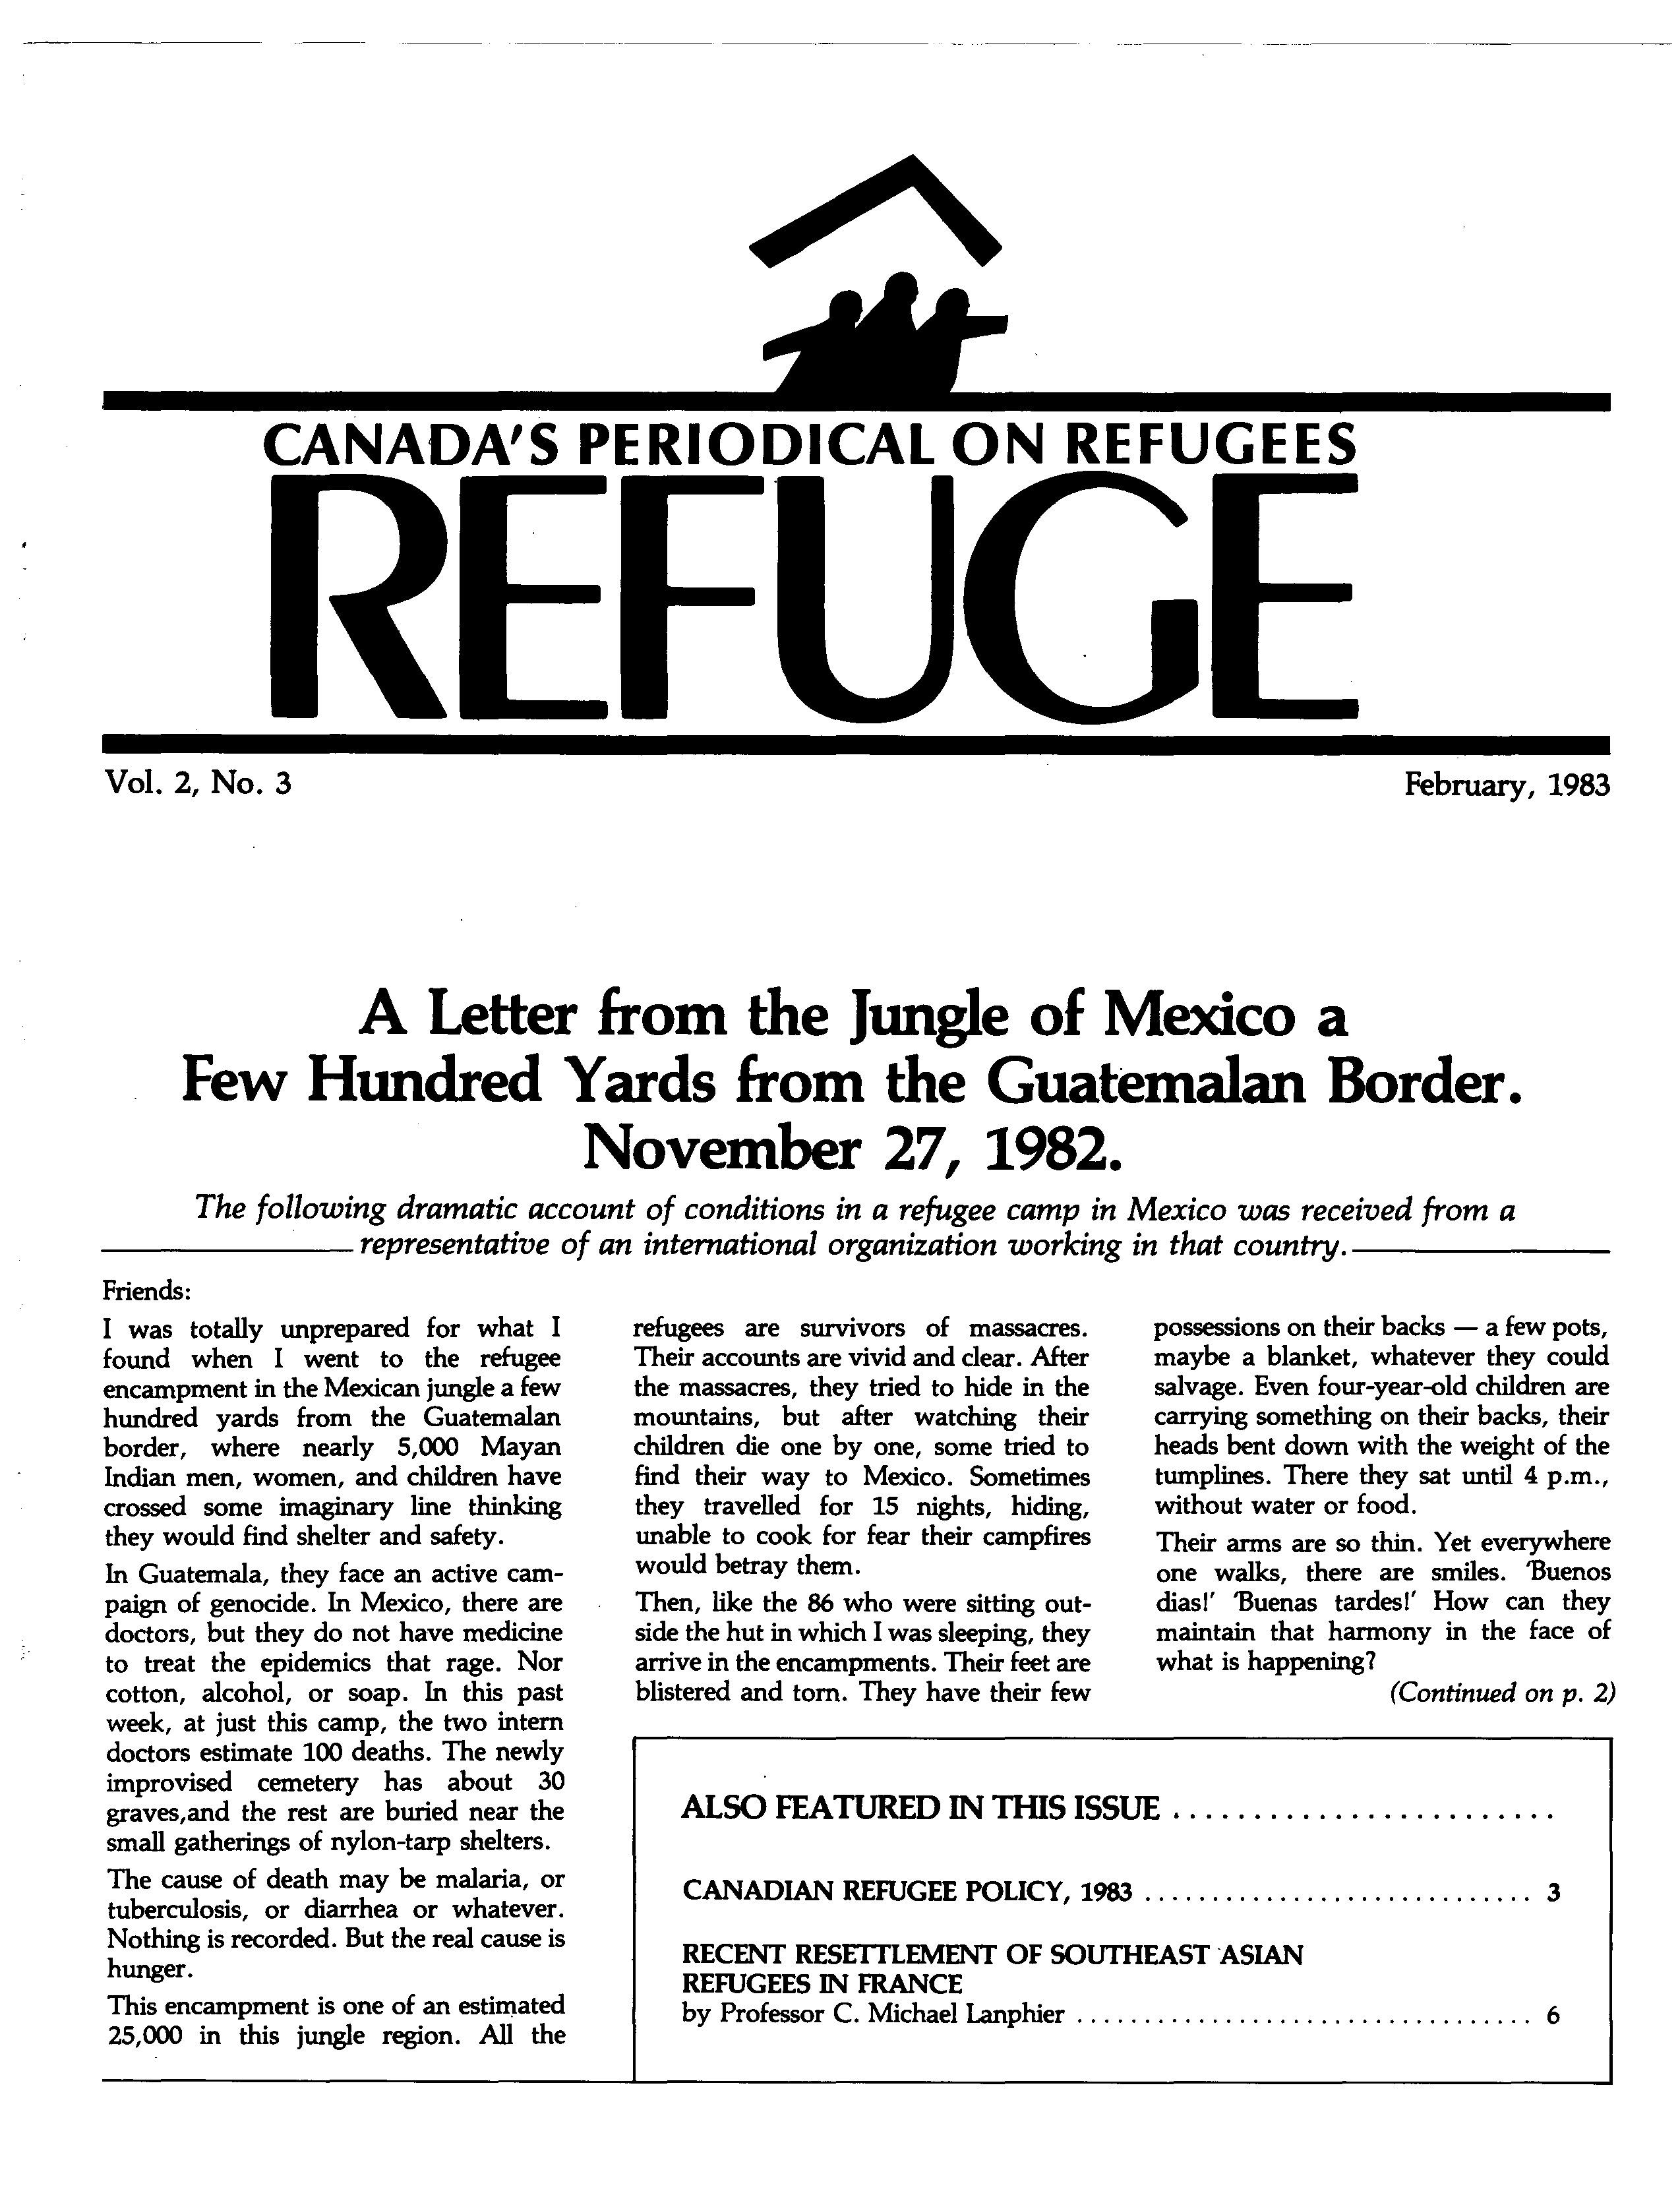 first page Refuge vol. 2.3 1983